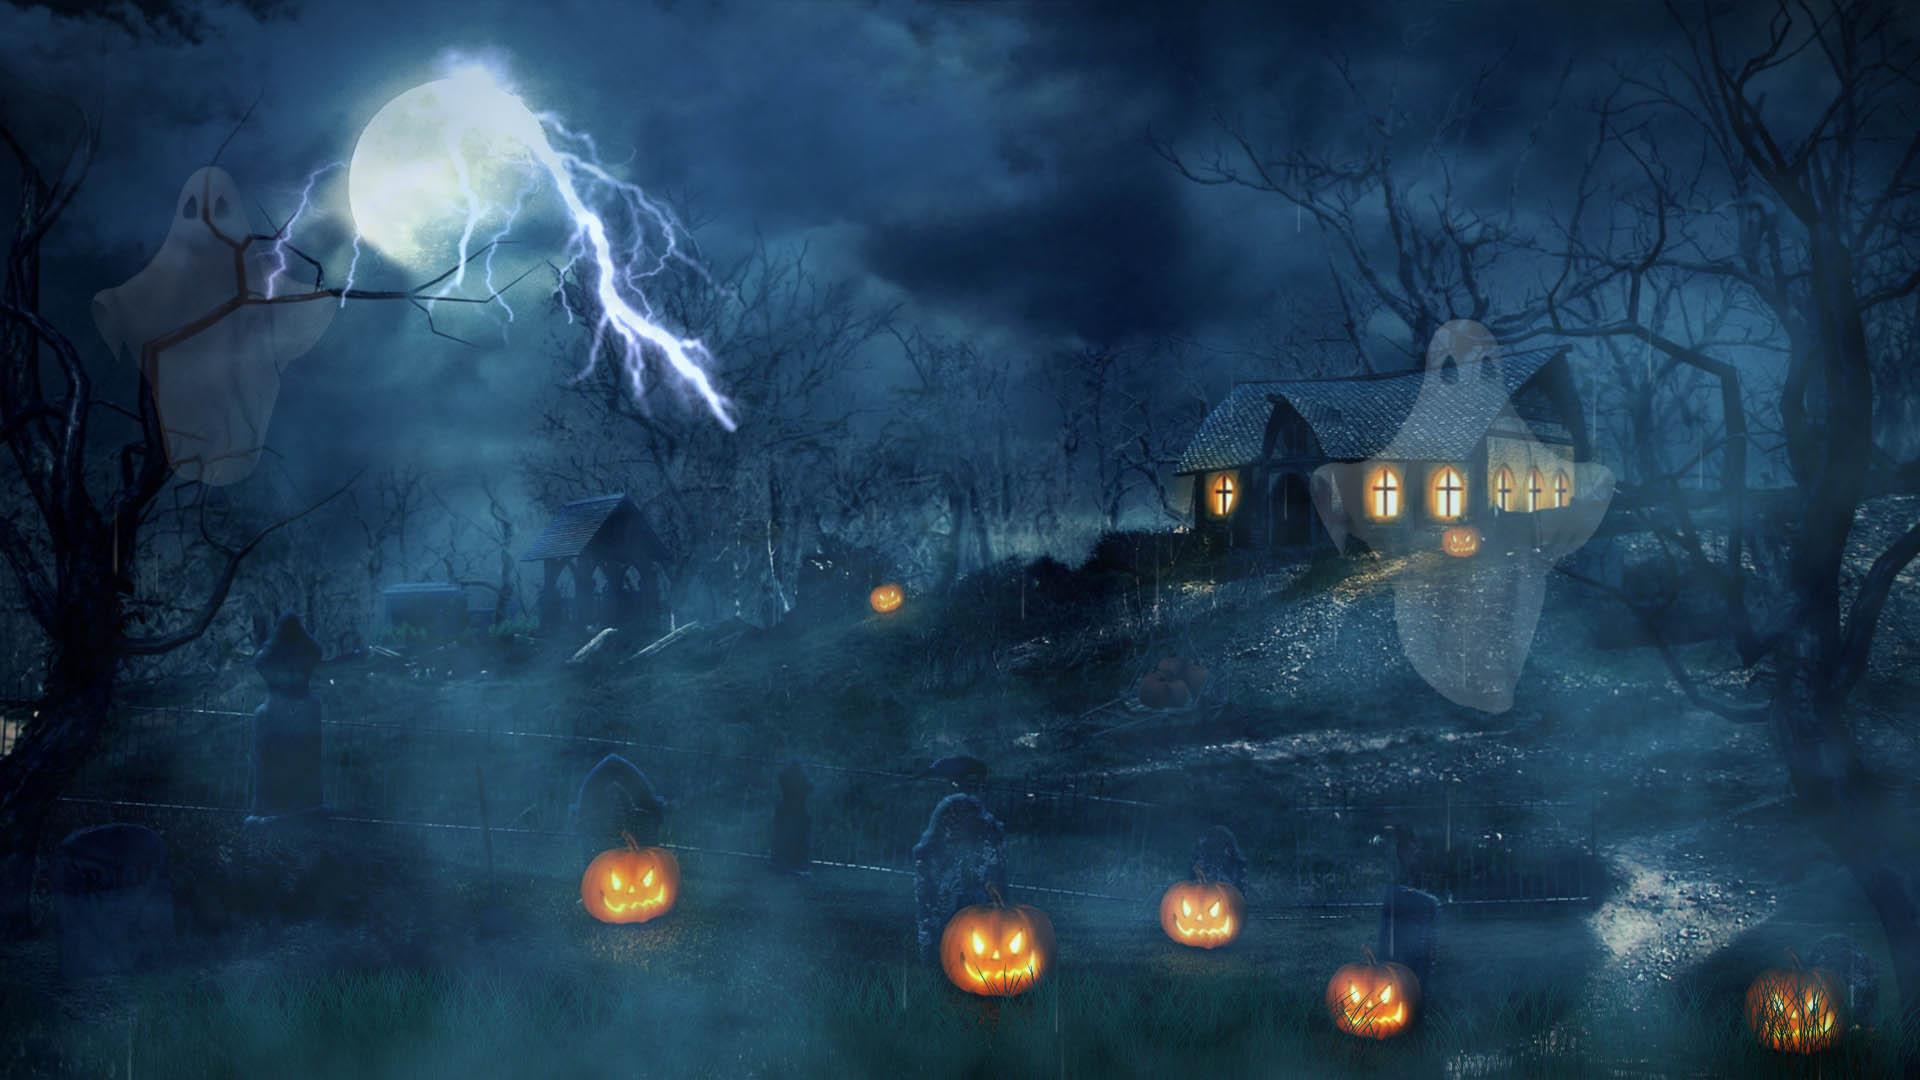 Free Halloween Screensaver - Halloween Dusk Screensaver ...